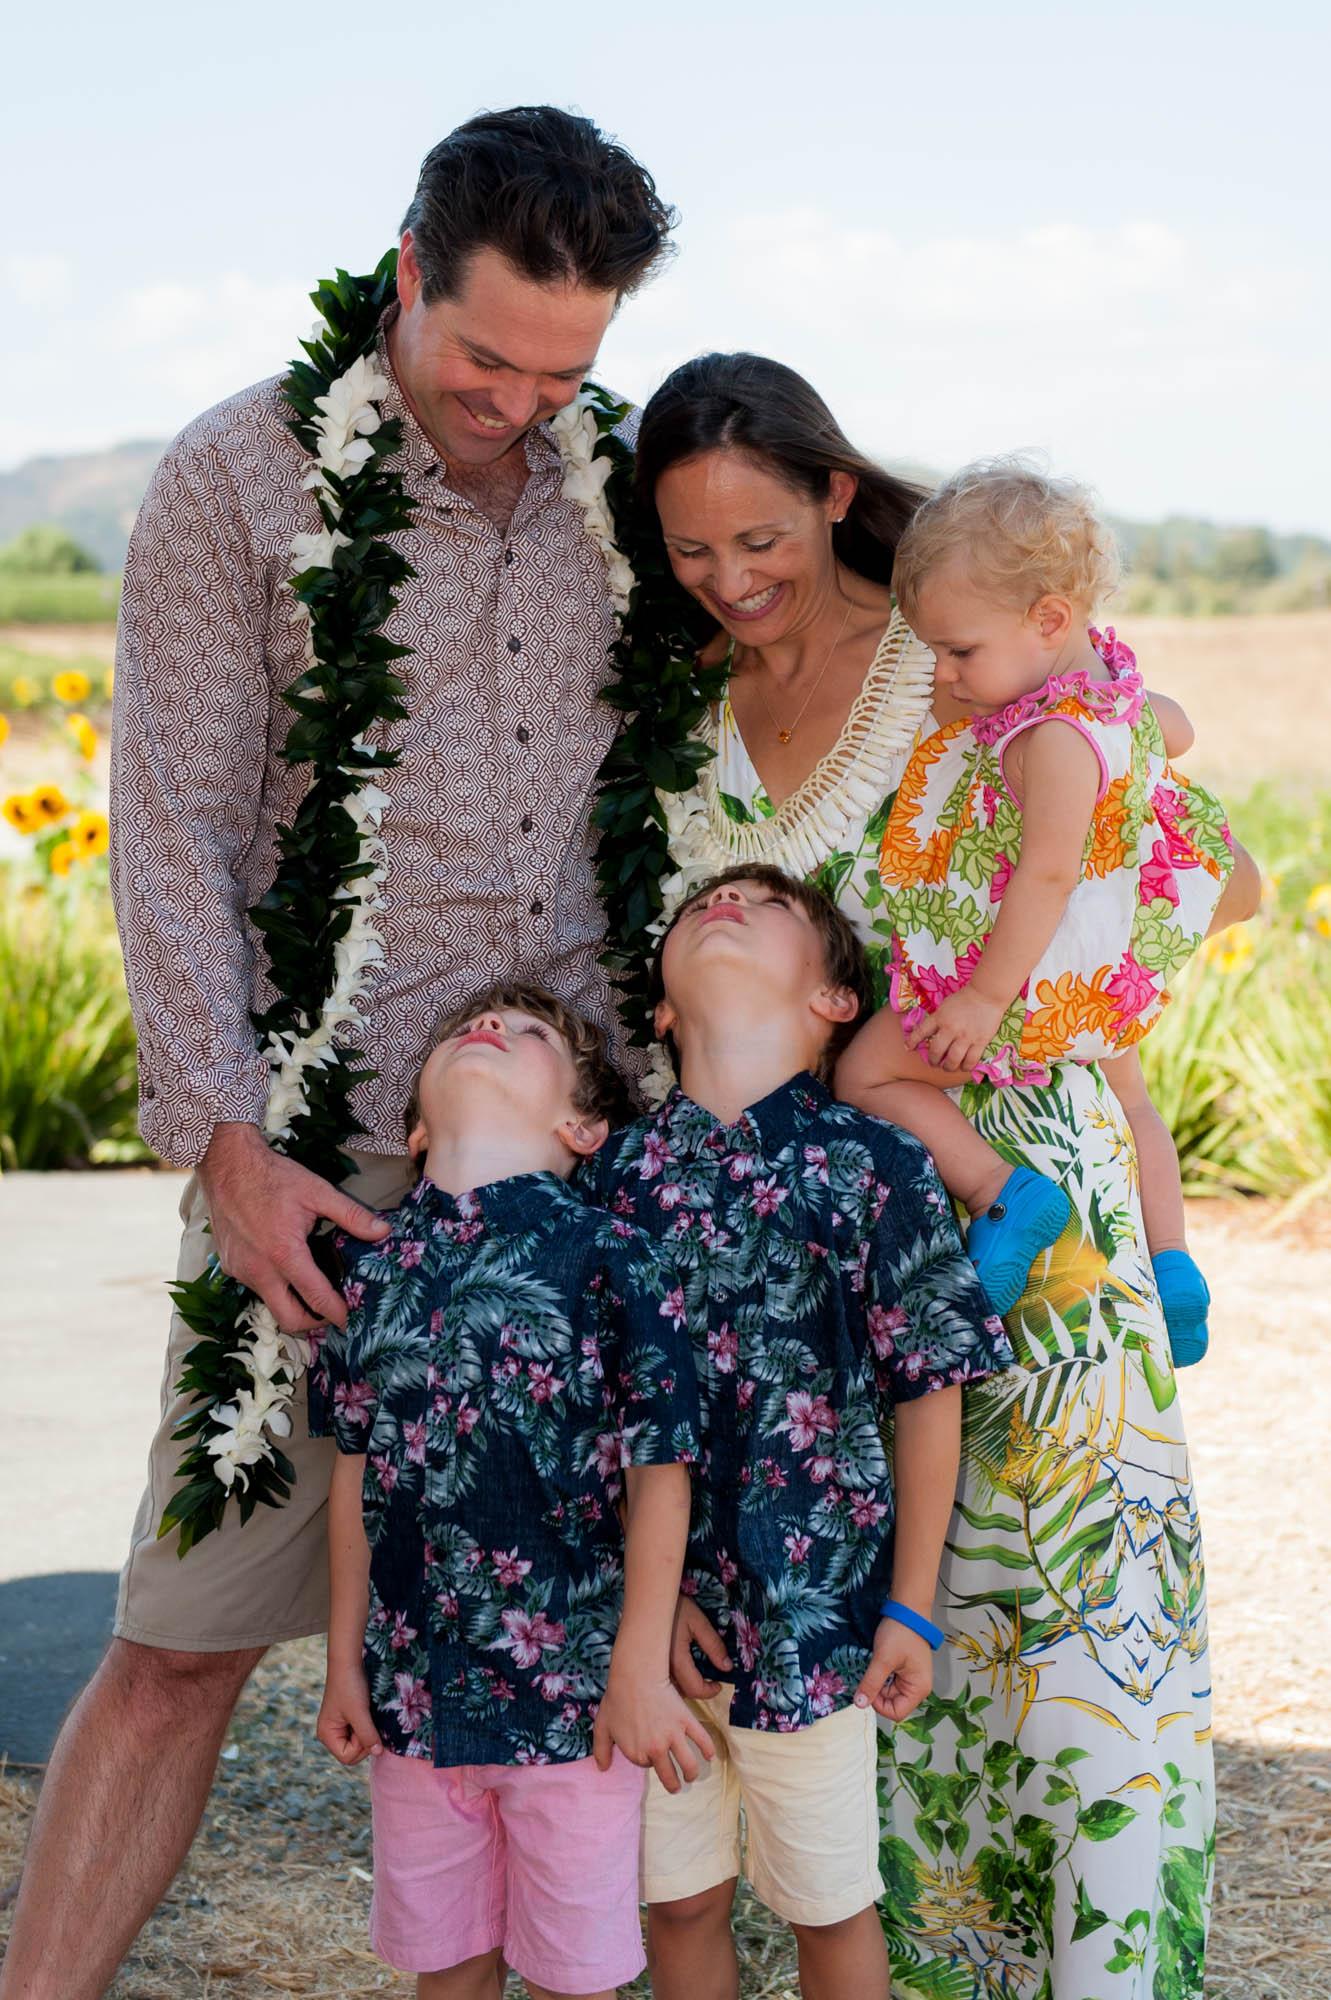 Family Reunion | Private Residence, Napa, California